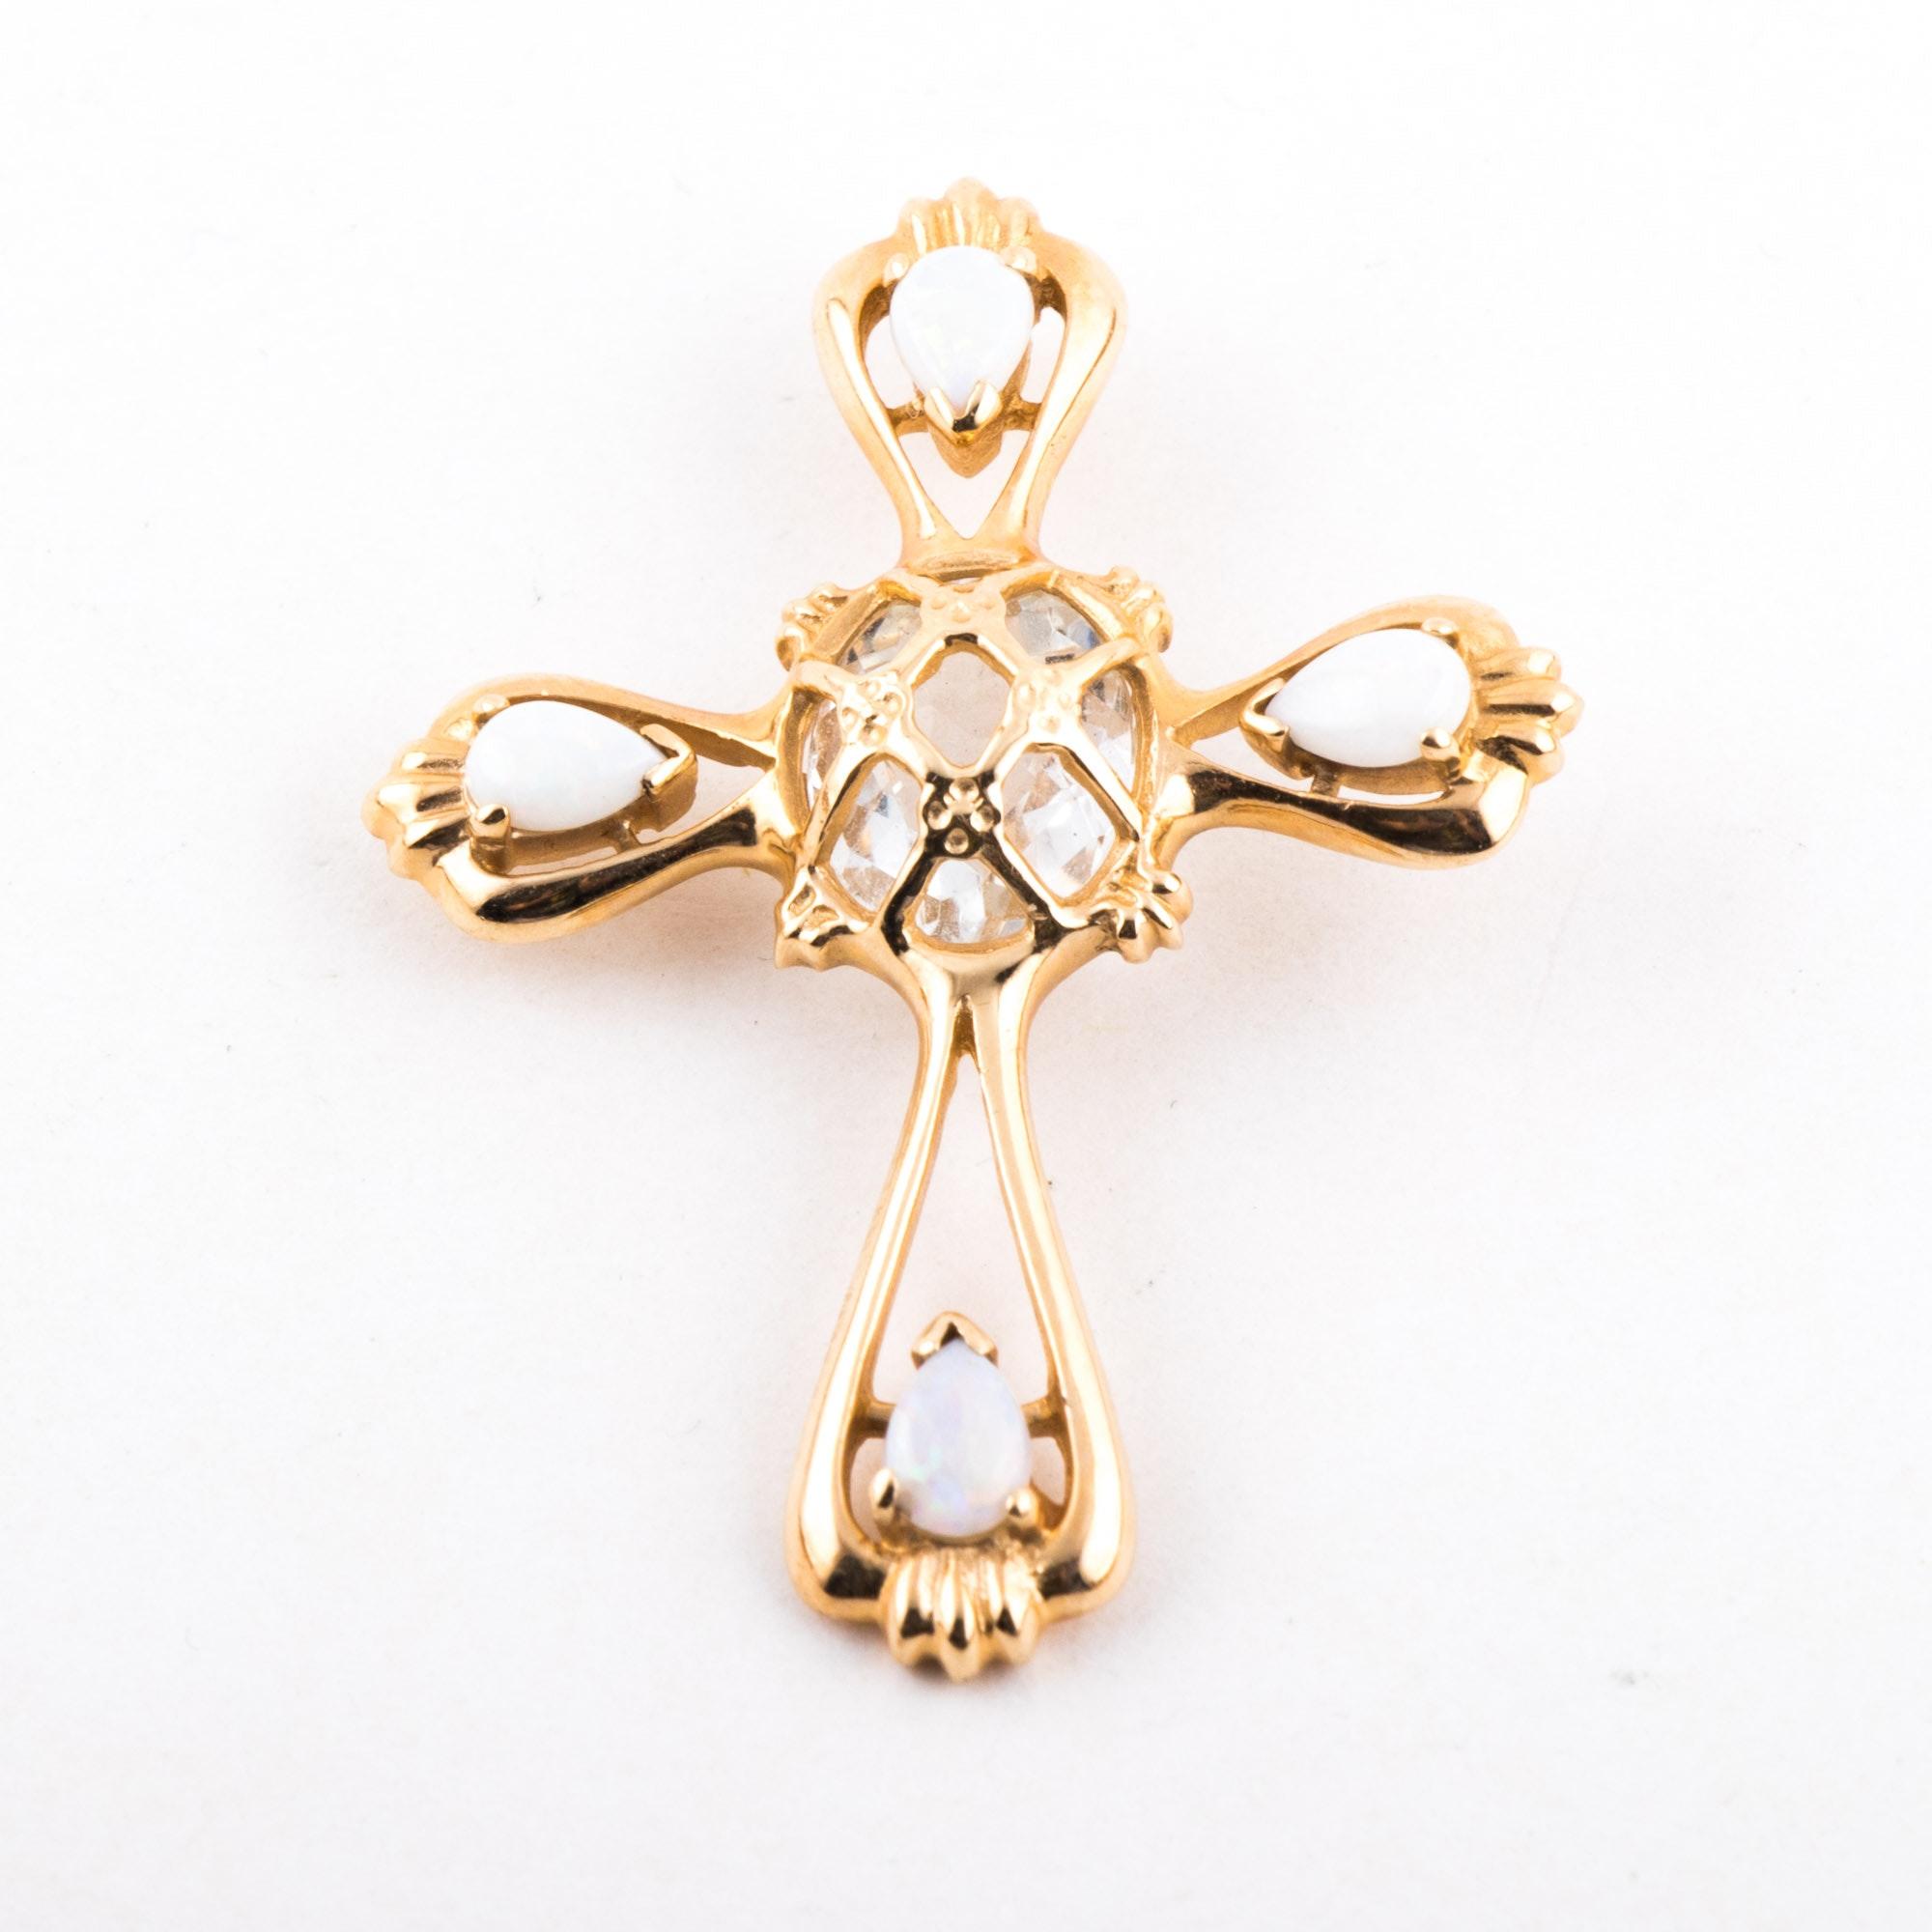 14K Yellow Gold, Quartz, and Opal Cross Pendant